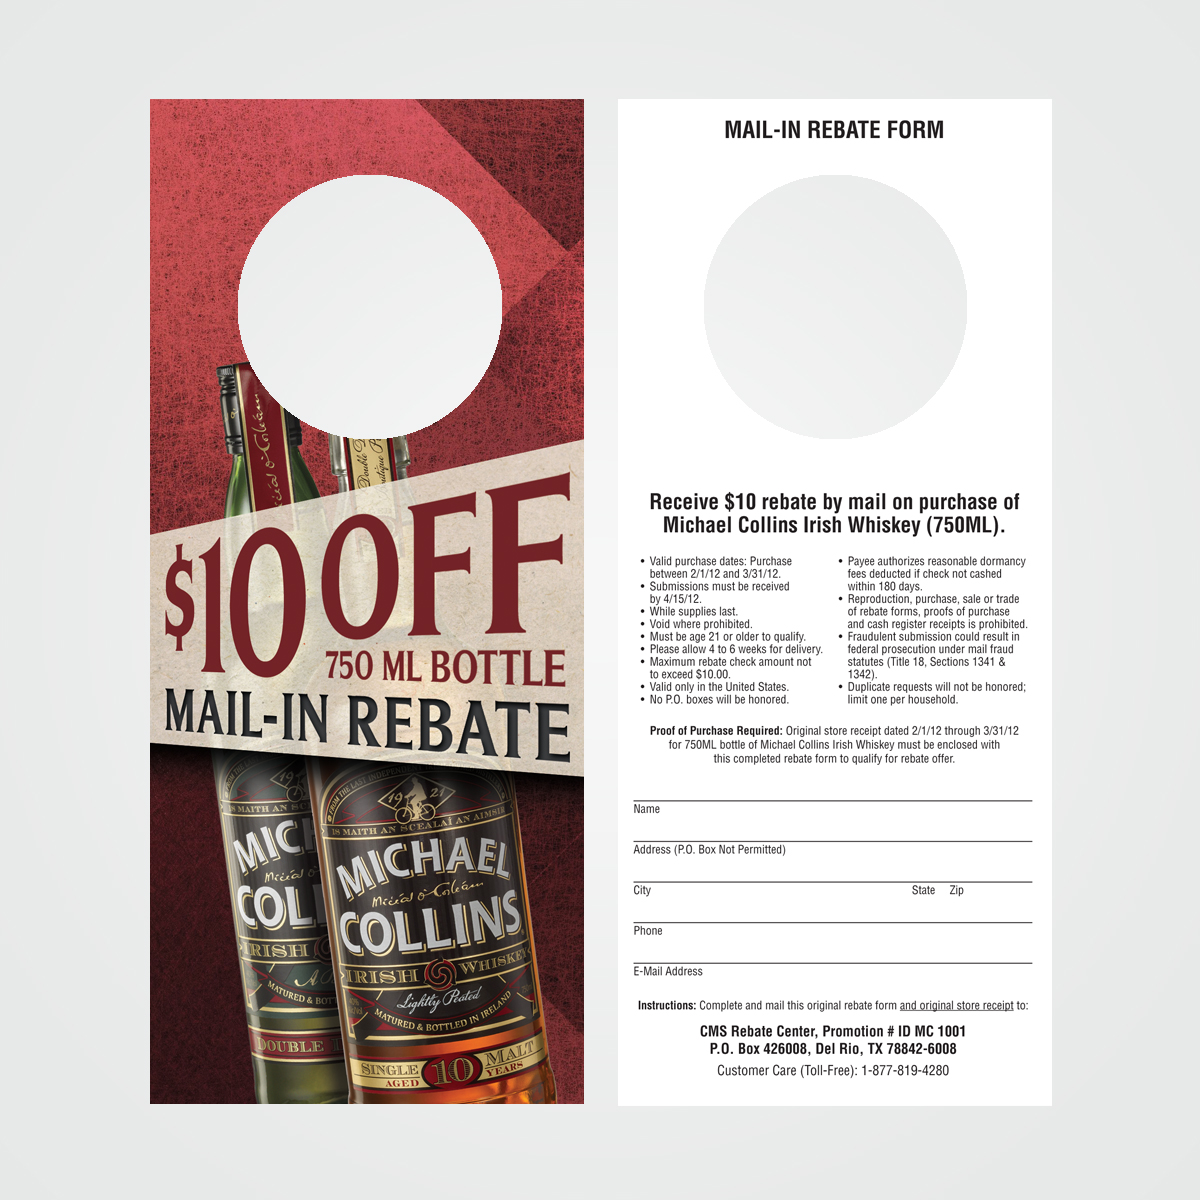 POS bottle necker rebate coupon for Michael Collins Irish Whiskey